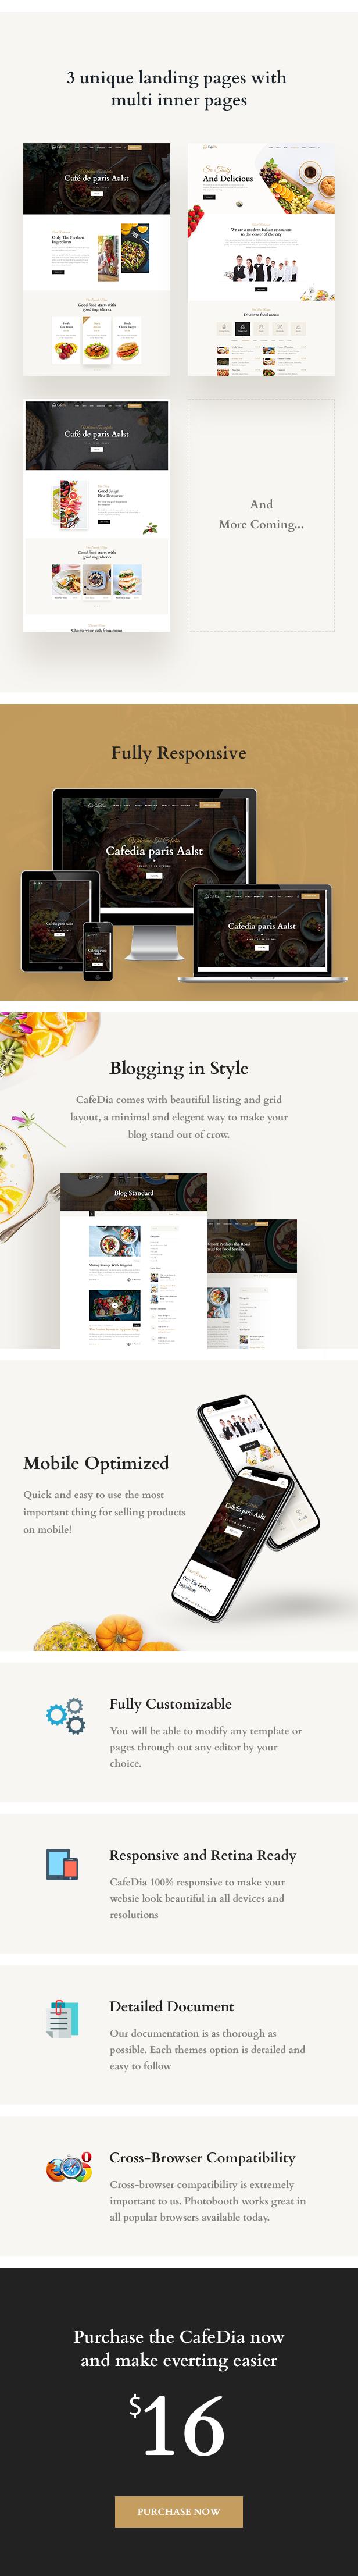 CafeDia- Restaurant HTML5 Template - 3